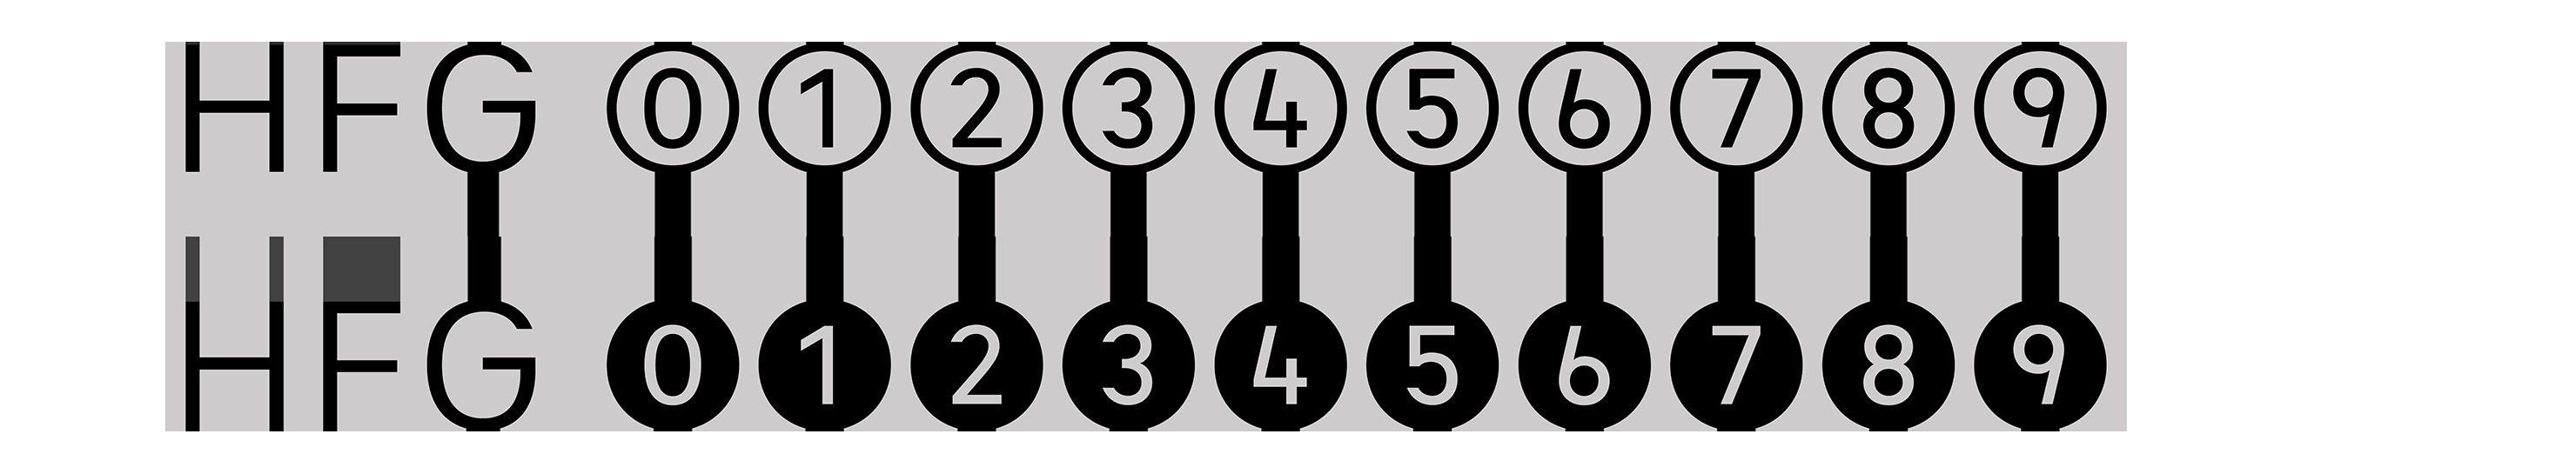 Typeface-Heimat-Sans-F16-Atlas-Font-Foundry